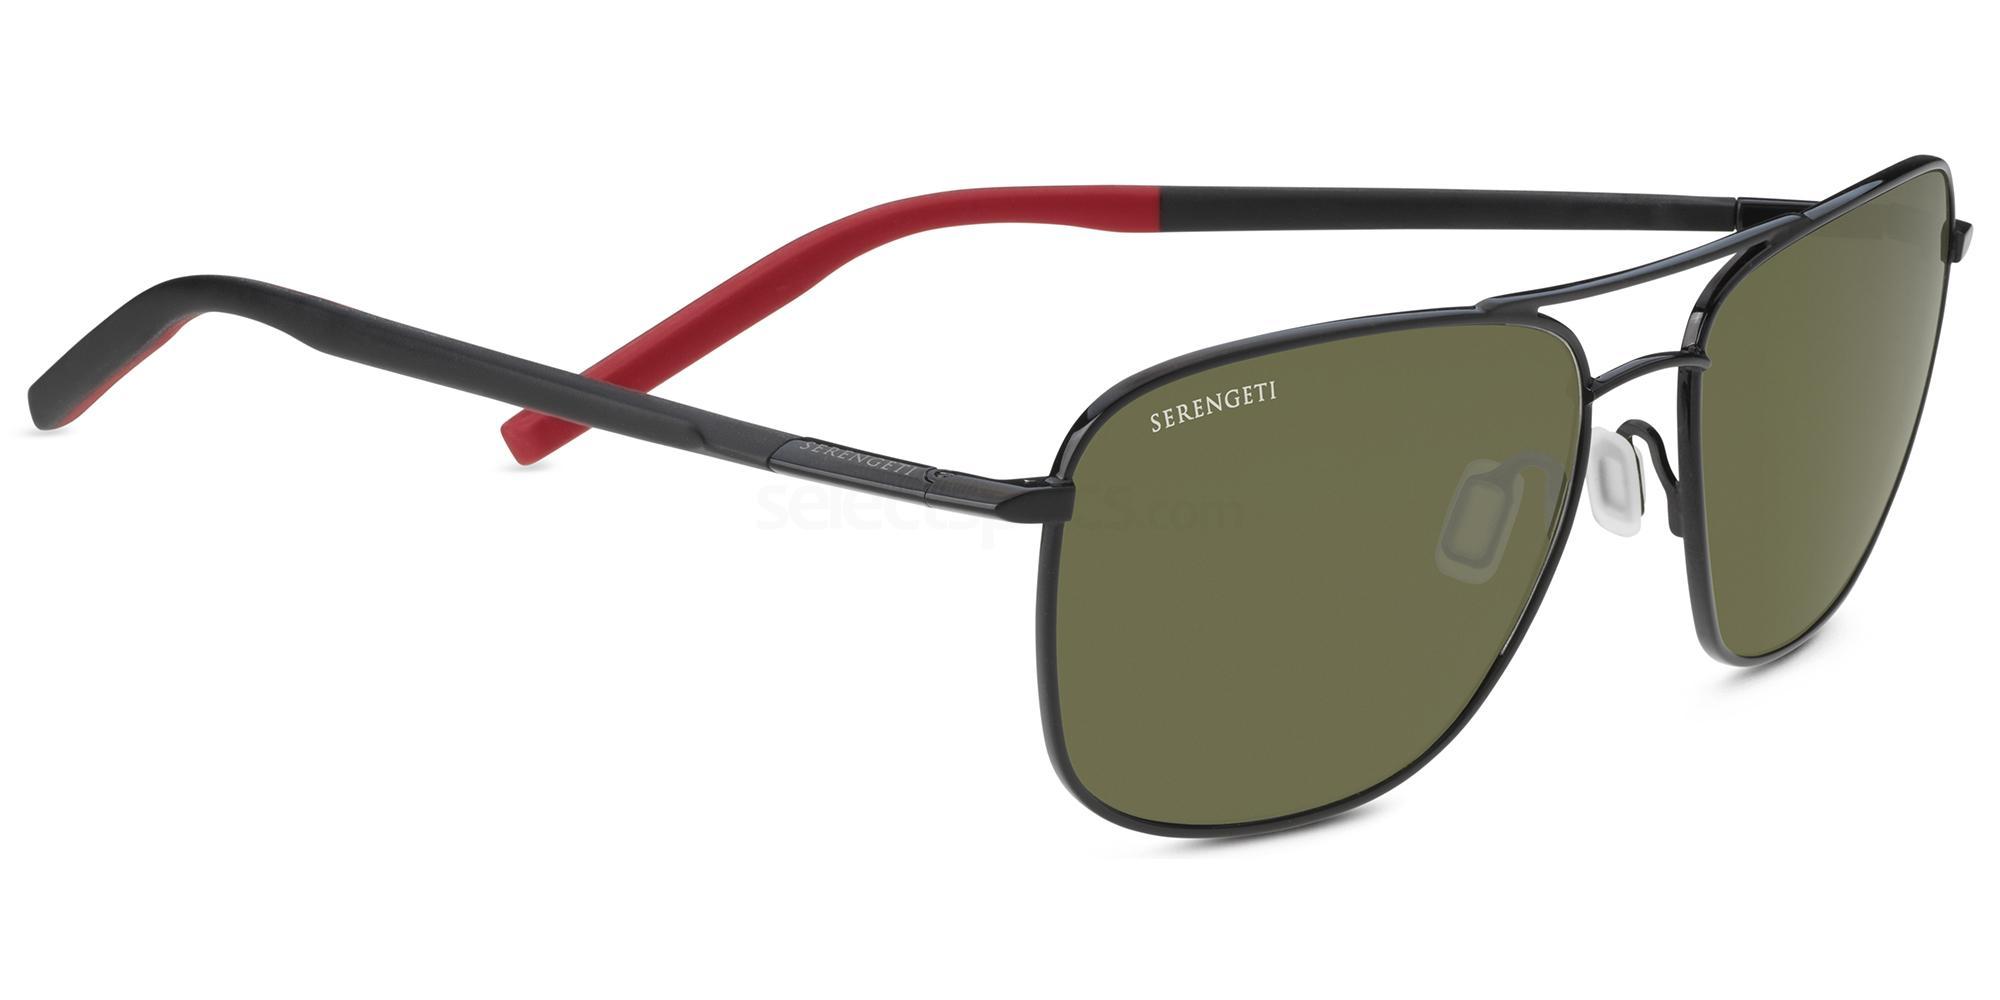 8796 SPELLO Sunglasses, Serengeti